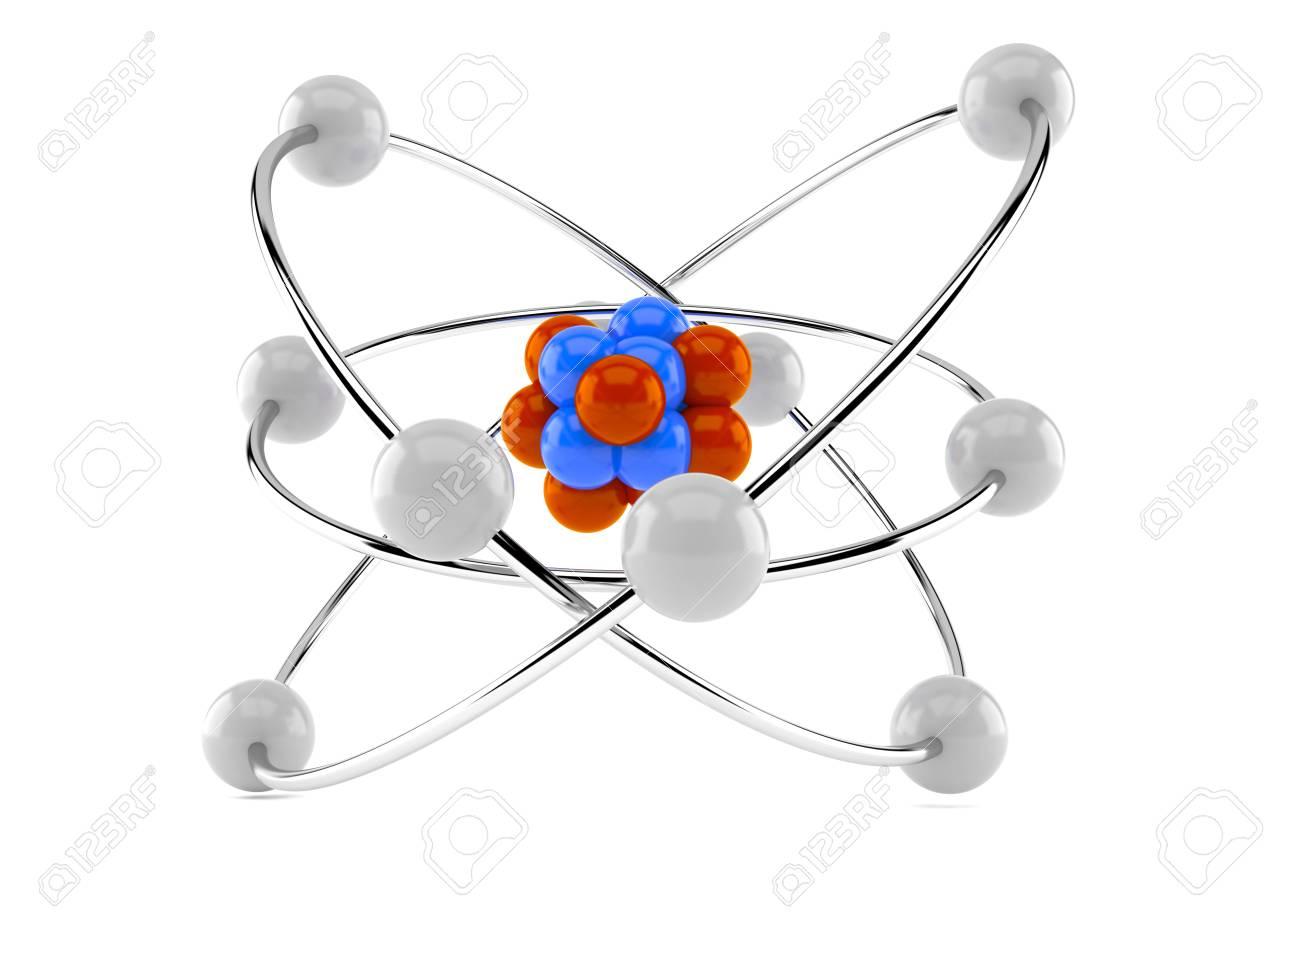 hight resolution of atom model isolated on white background stock photo 81306117